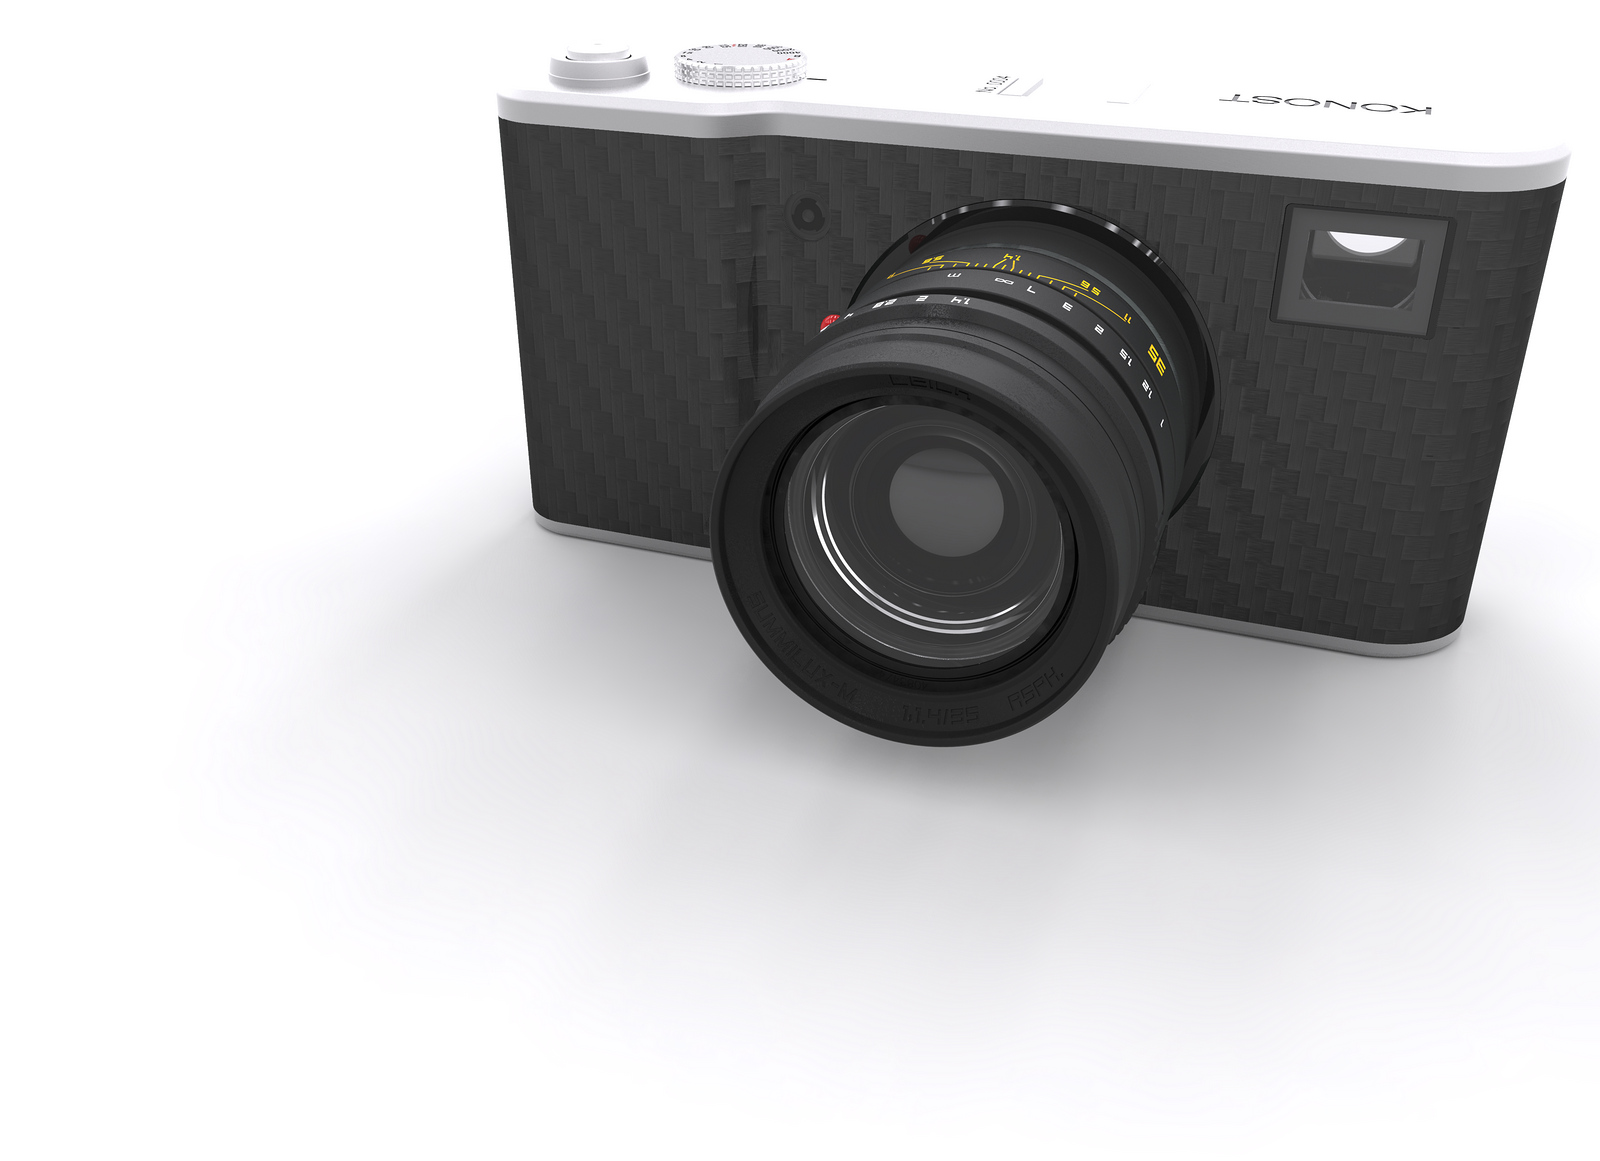 Камера Konost, отделка из углеволокна